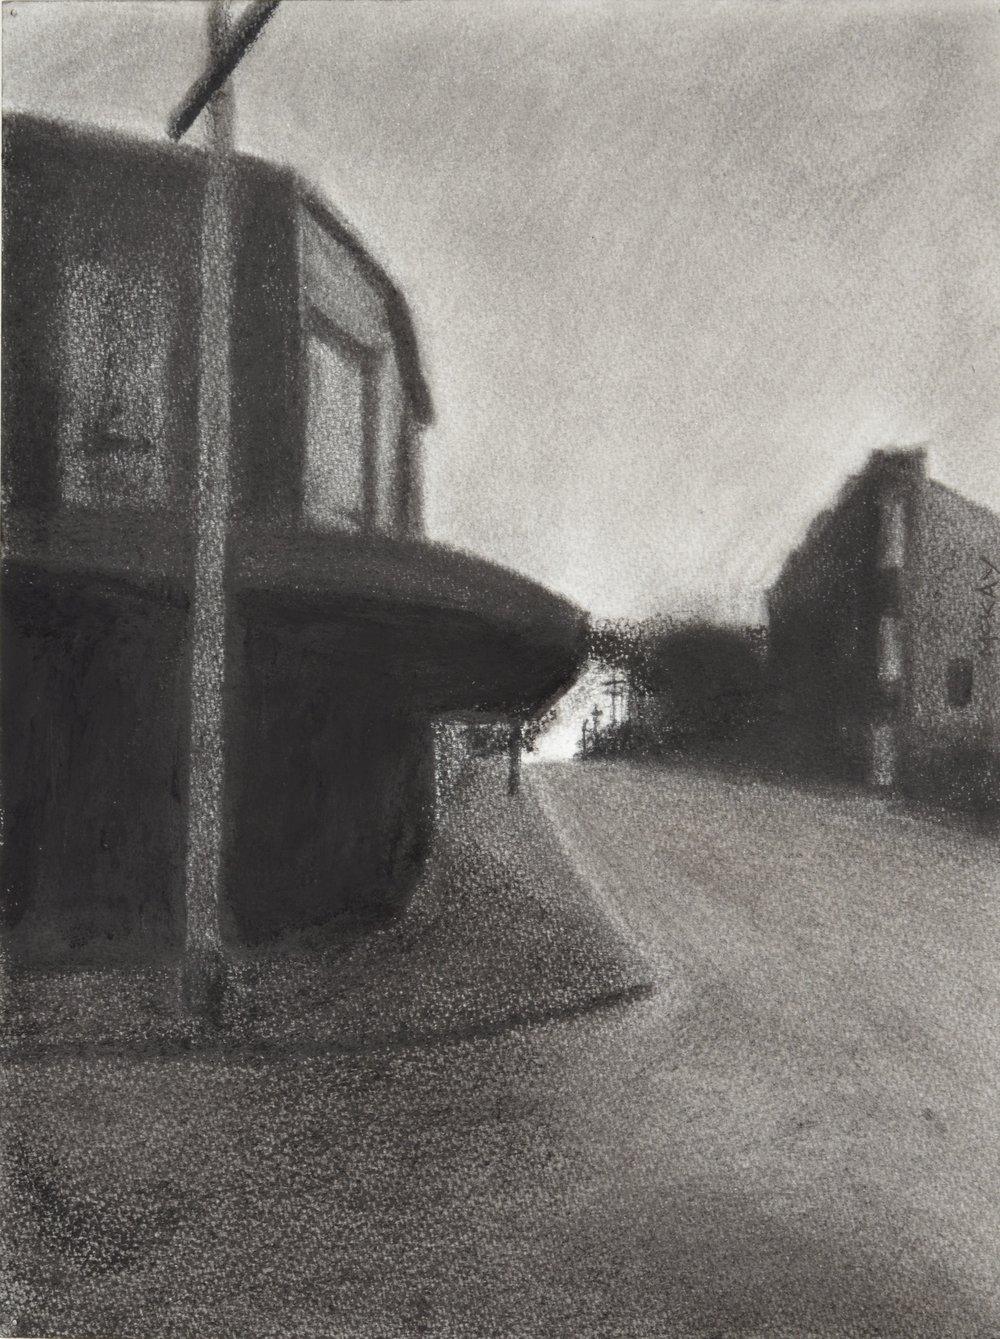 Montague Street (Overcast)